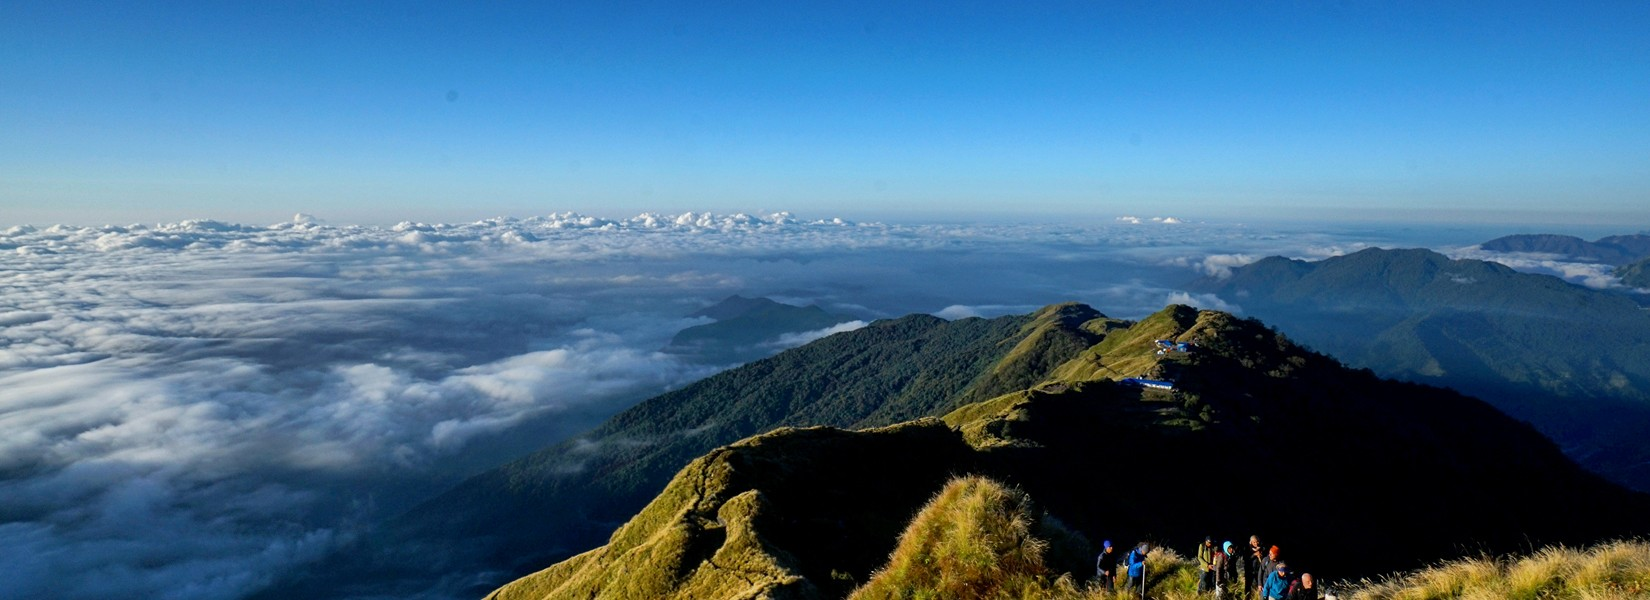 Mardi Himal (ACAP) - 5,587 m